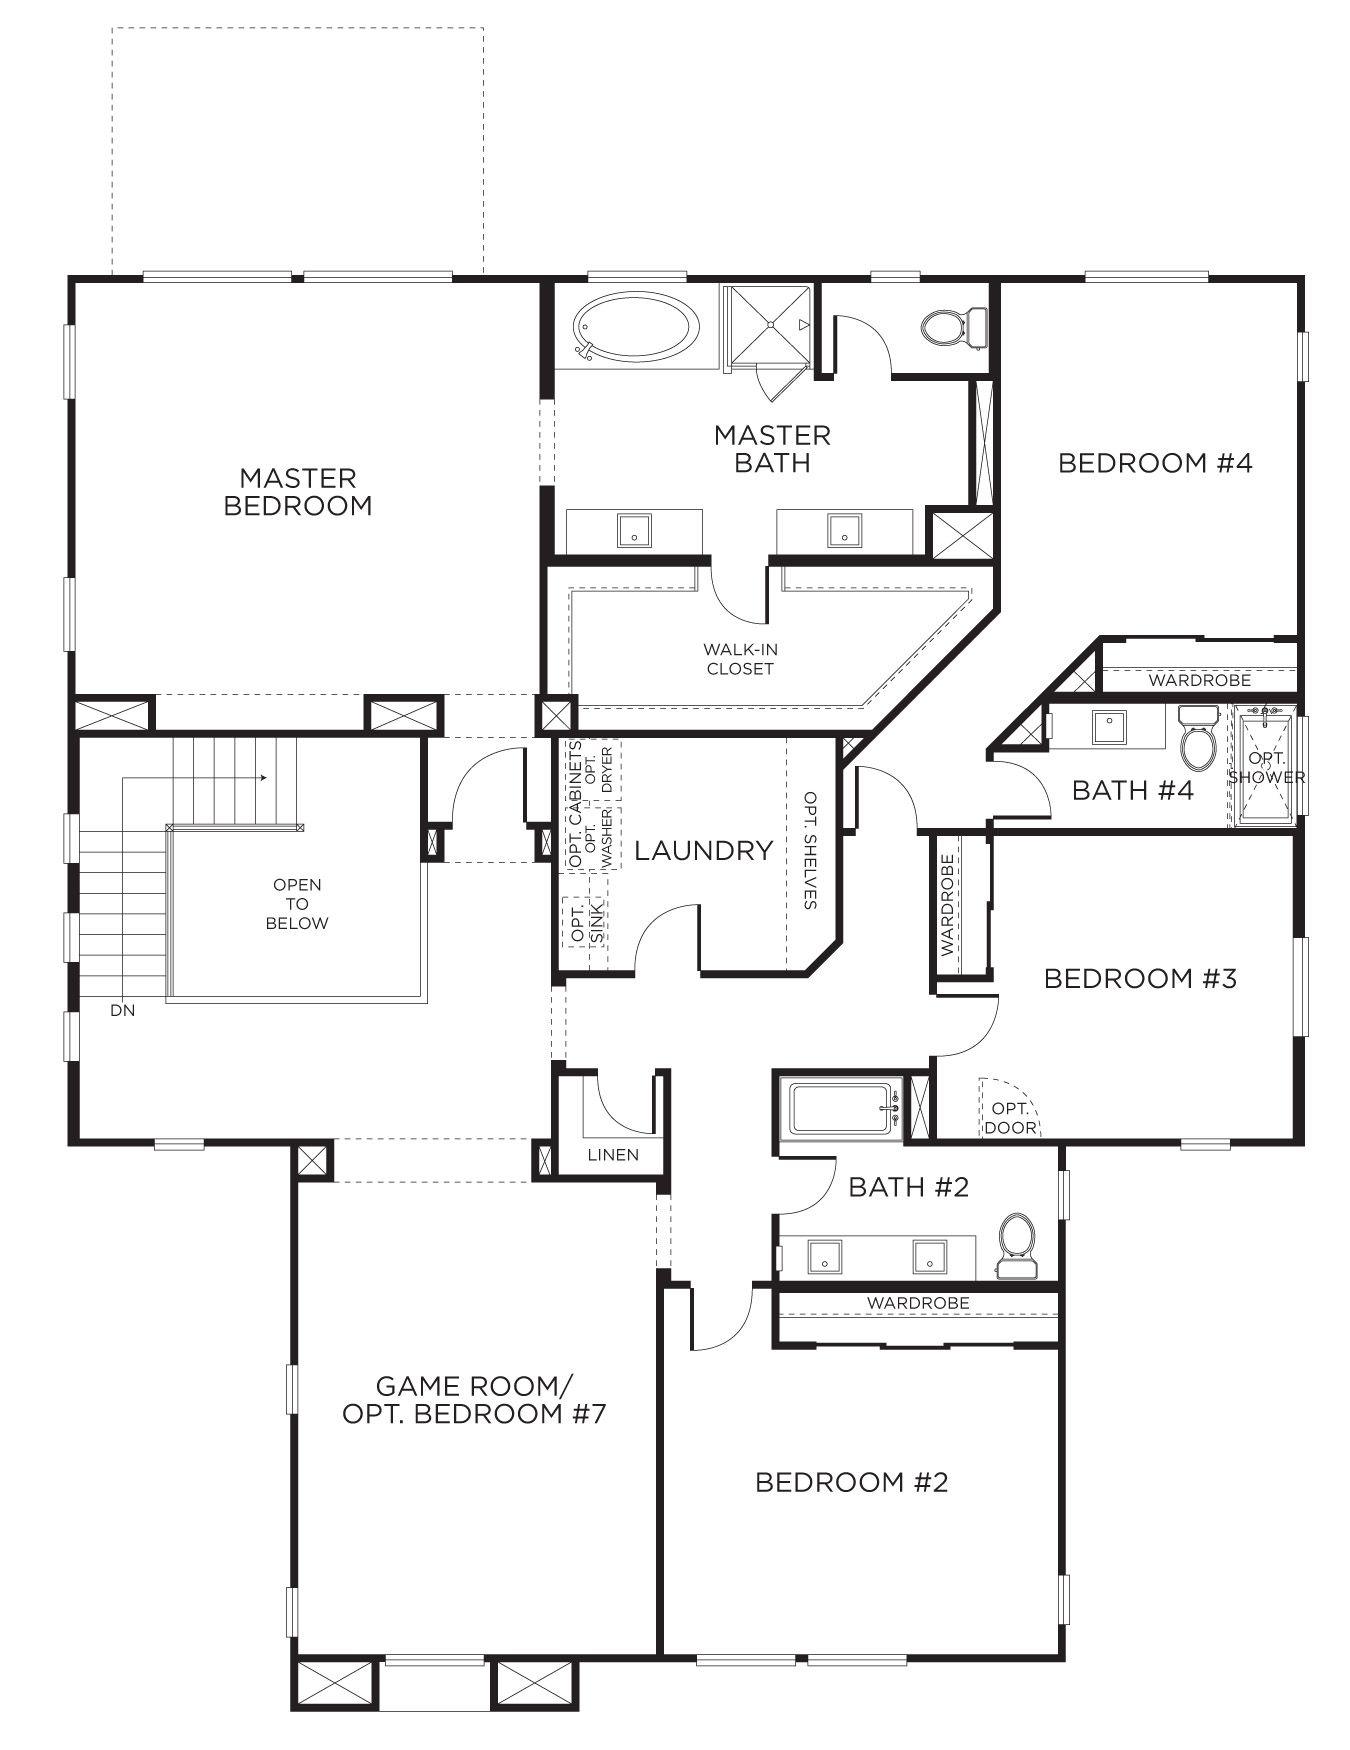 Master Bedroom Suite Layouts Meadow Ridge Plan 4xa With Gensmart Suite Separate Living Space